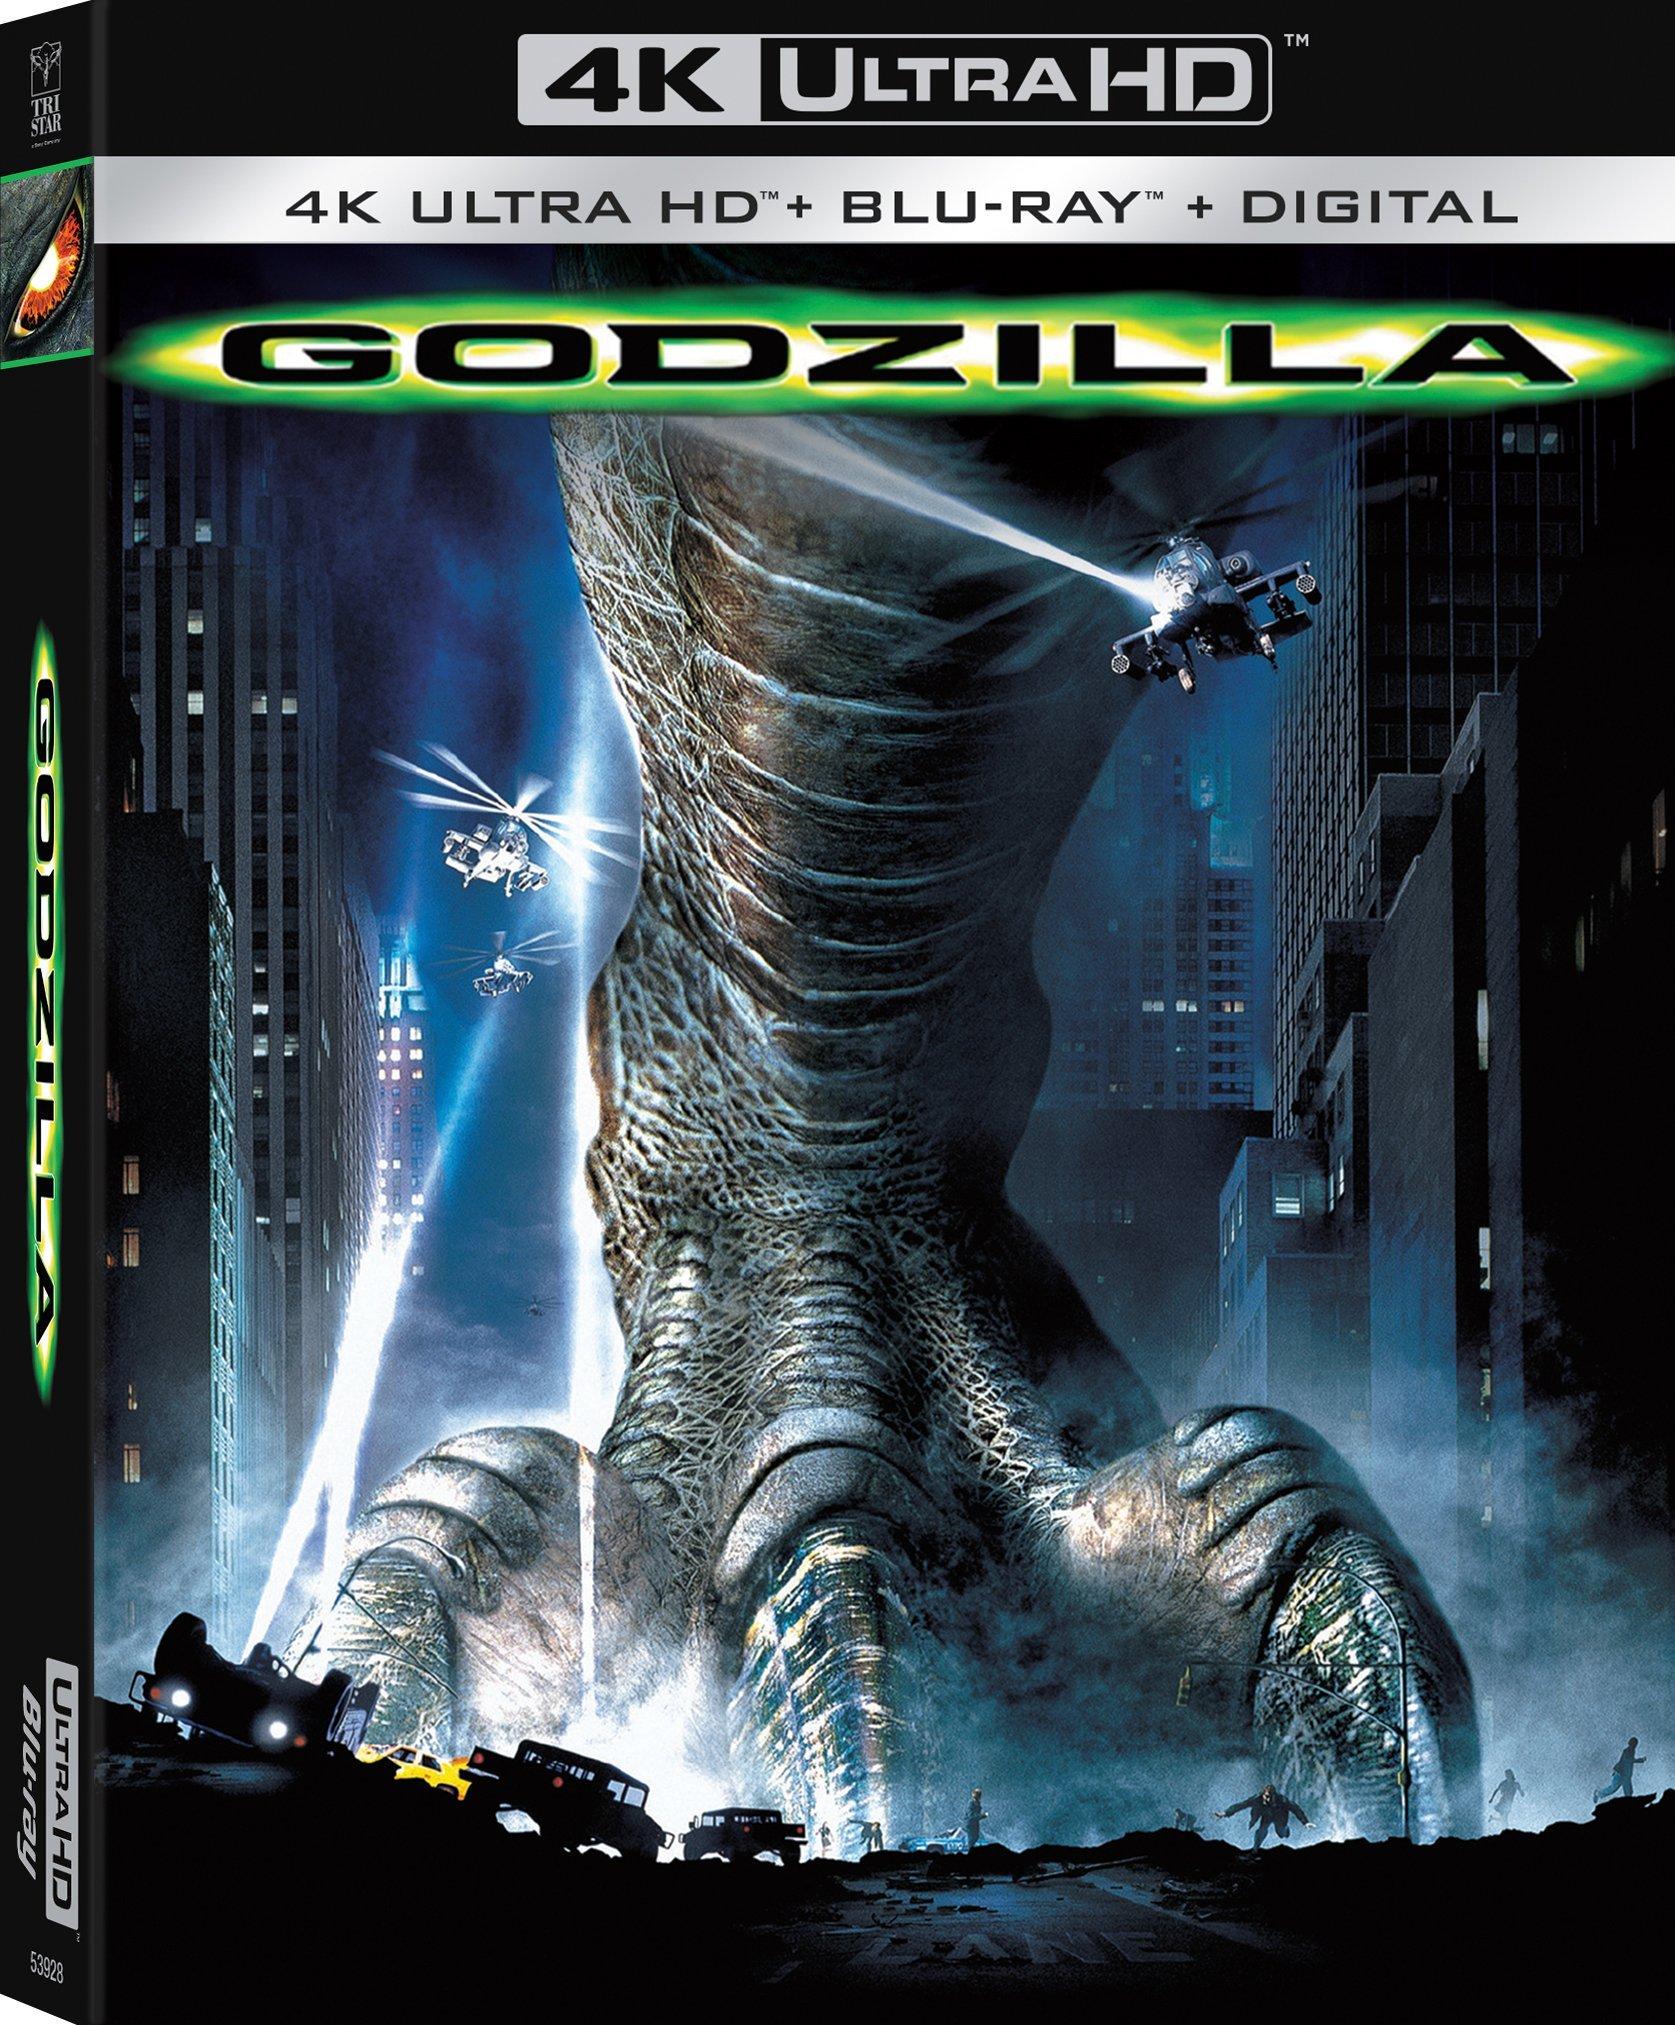 Godzilla (1998)(4K Ultra HD Blu-ray)(Pre-order / May 14)